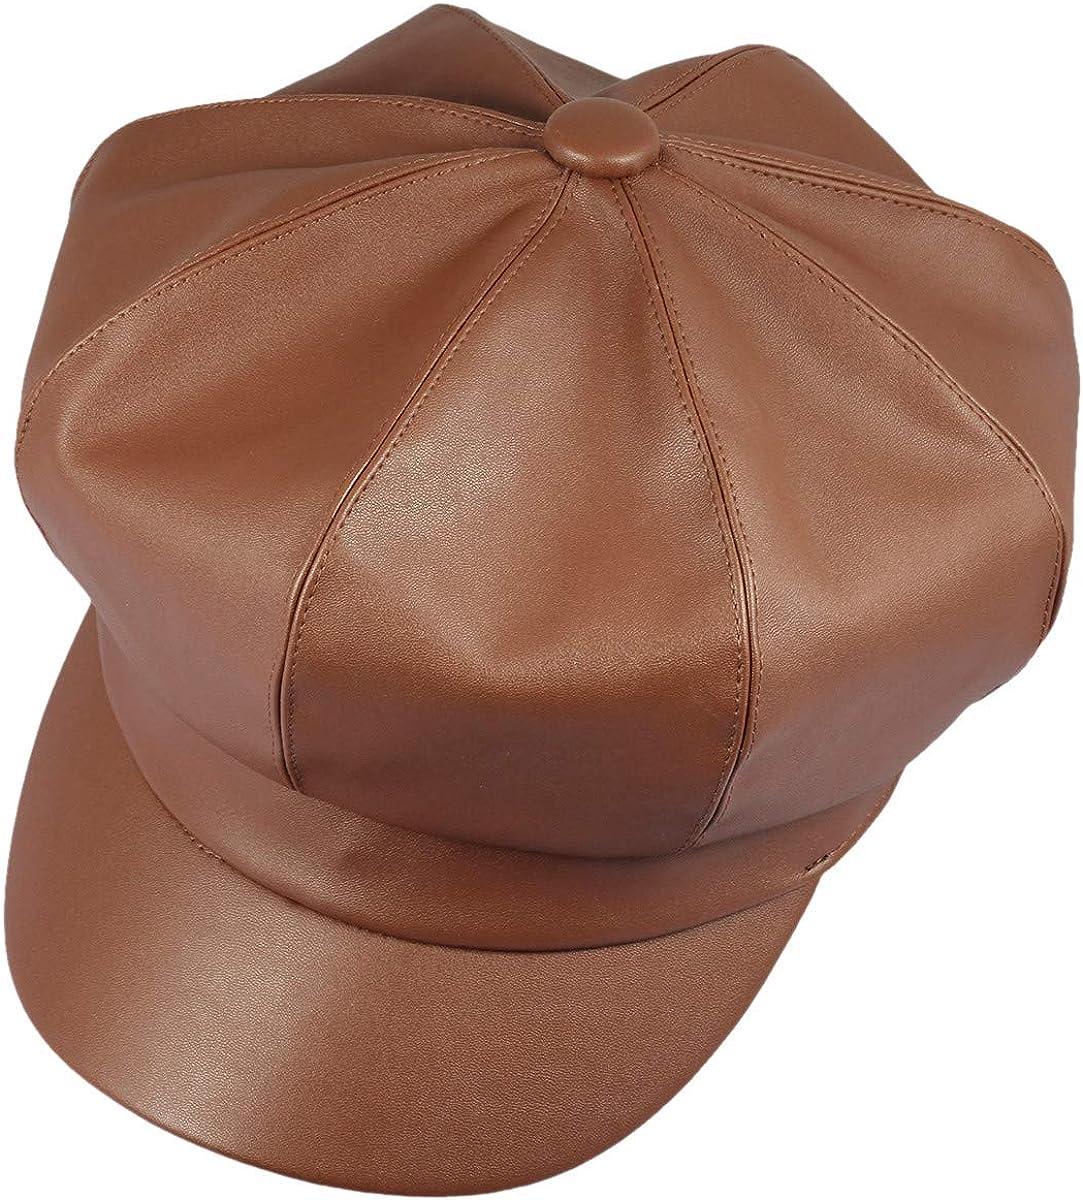 KYEYGWO Beret Hats for Women PU Leather Baker Hat Newsboy Cabbie Cap Peaker Winter Hats for Ladies